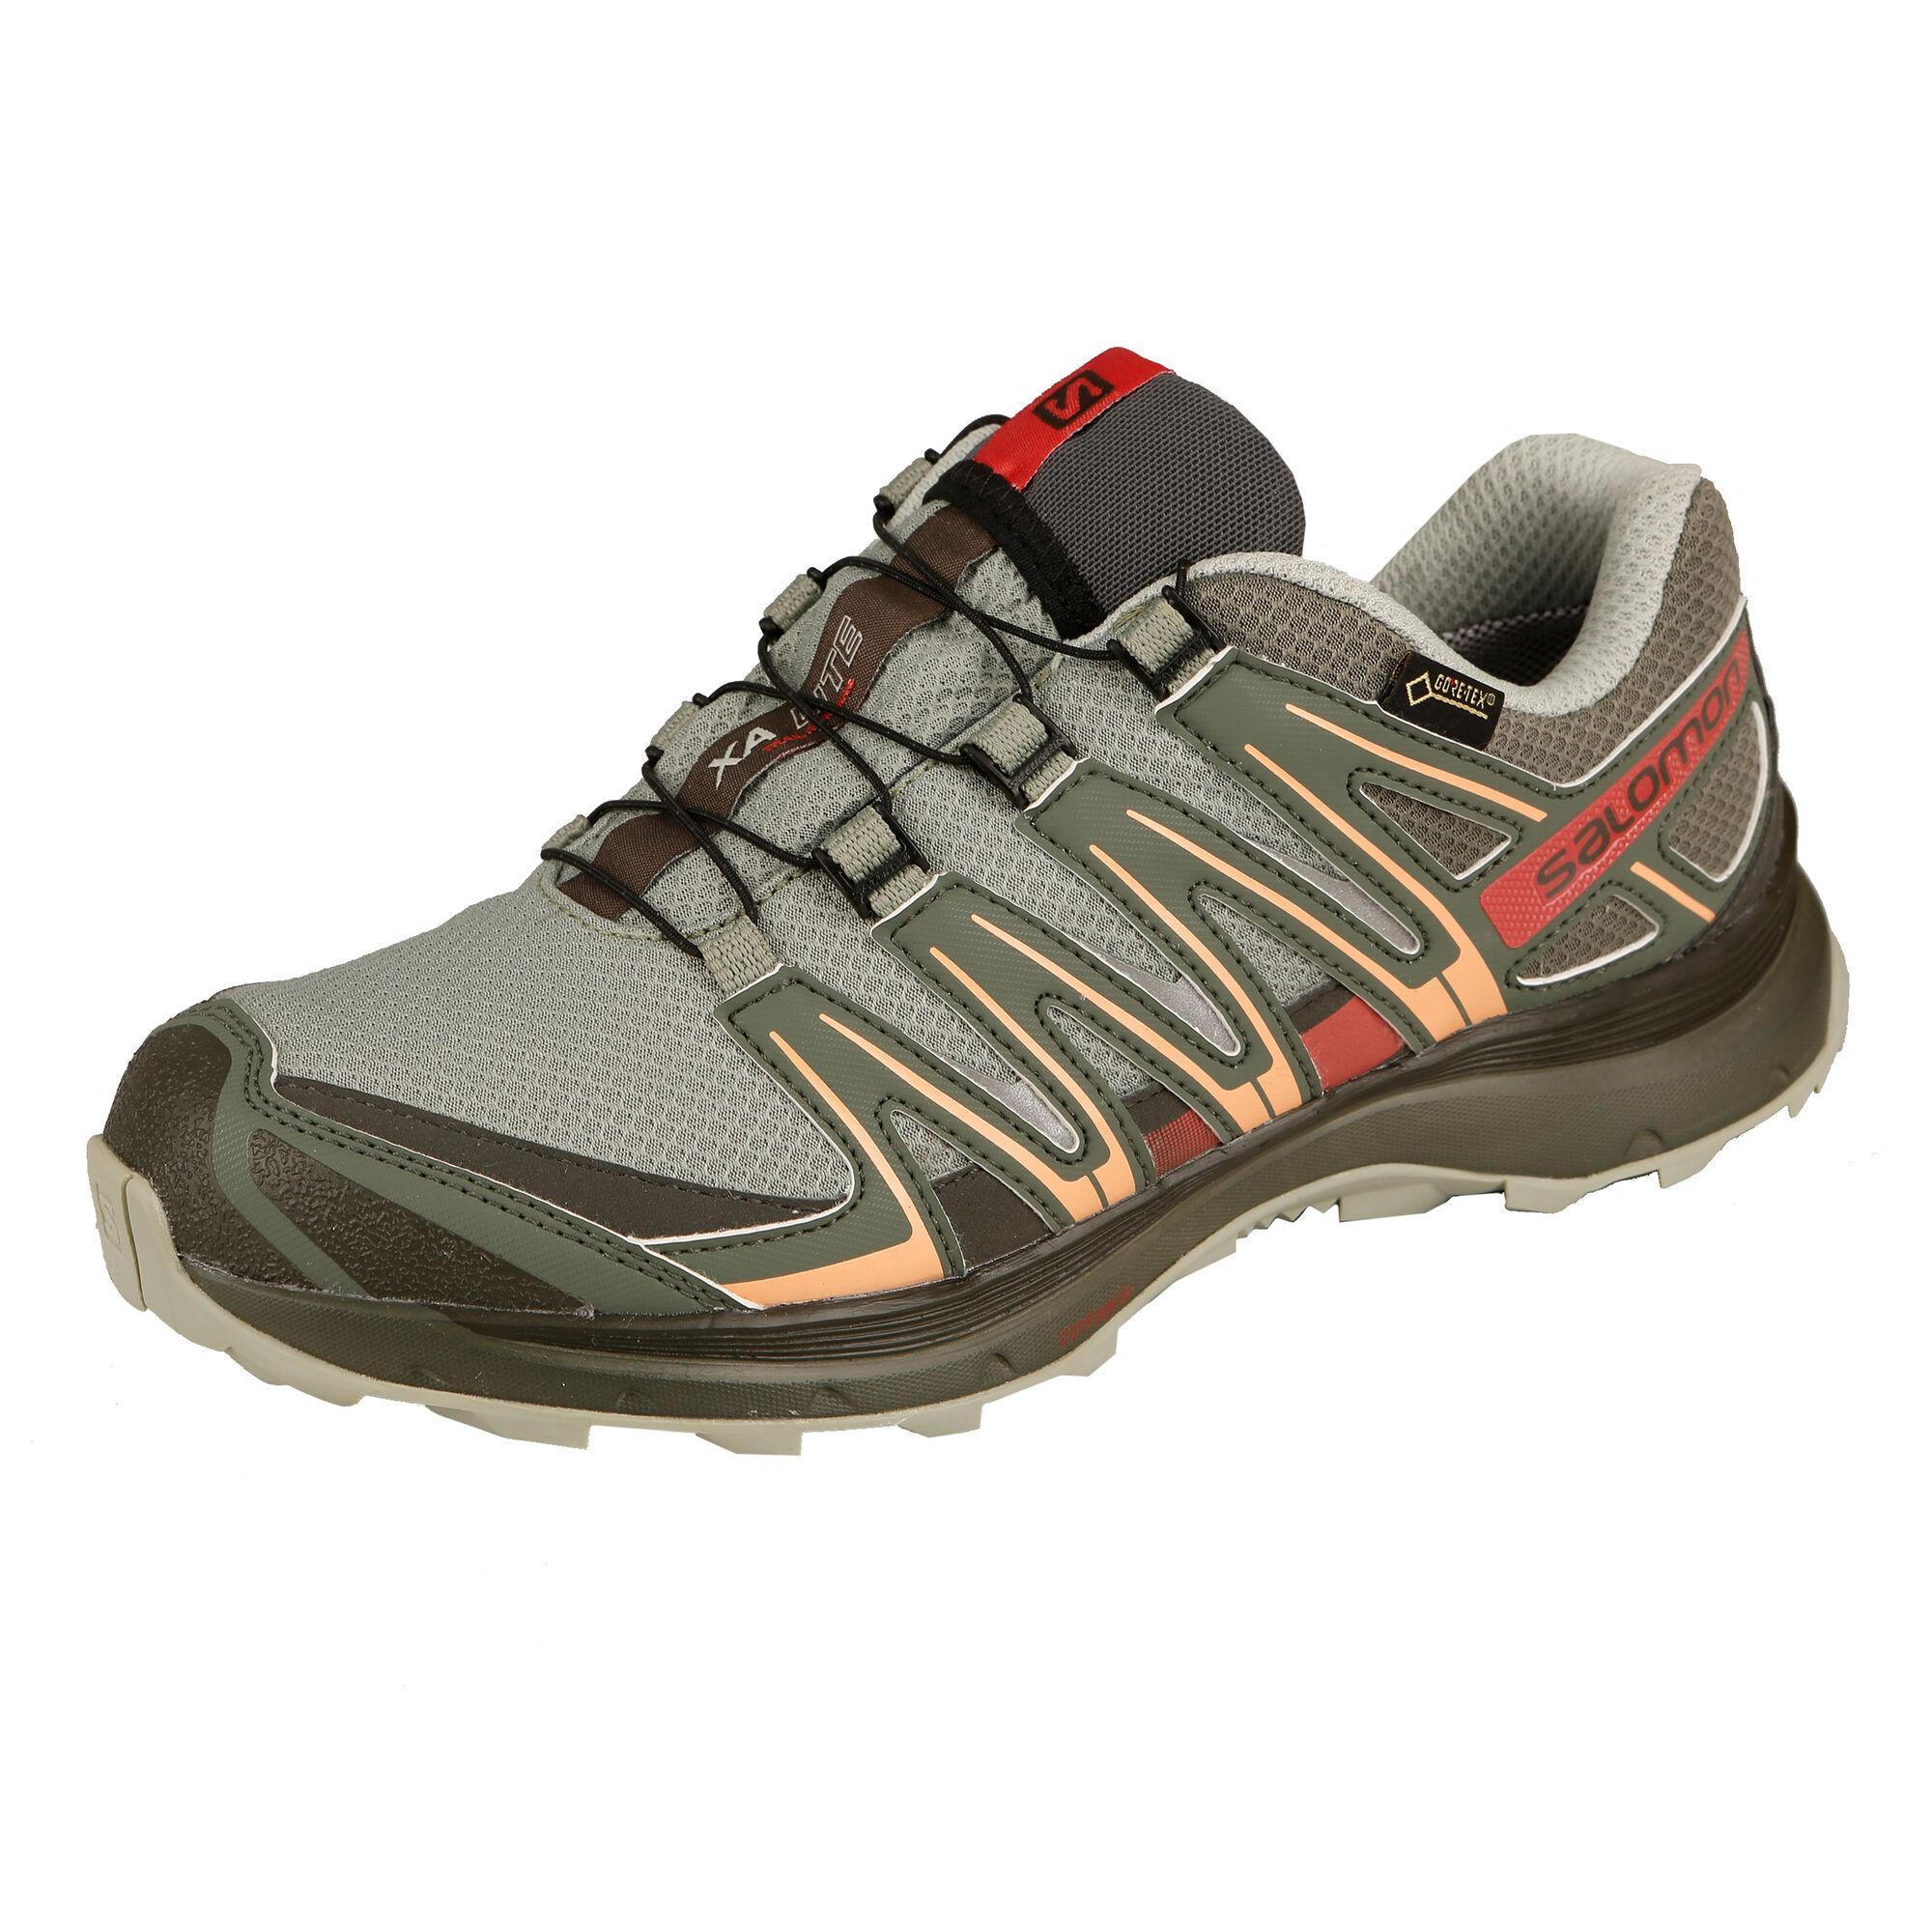 5ce5abb6f485 buy Salomon XA Lite GTX Trail Running Shoe Women - Dark Grey ...